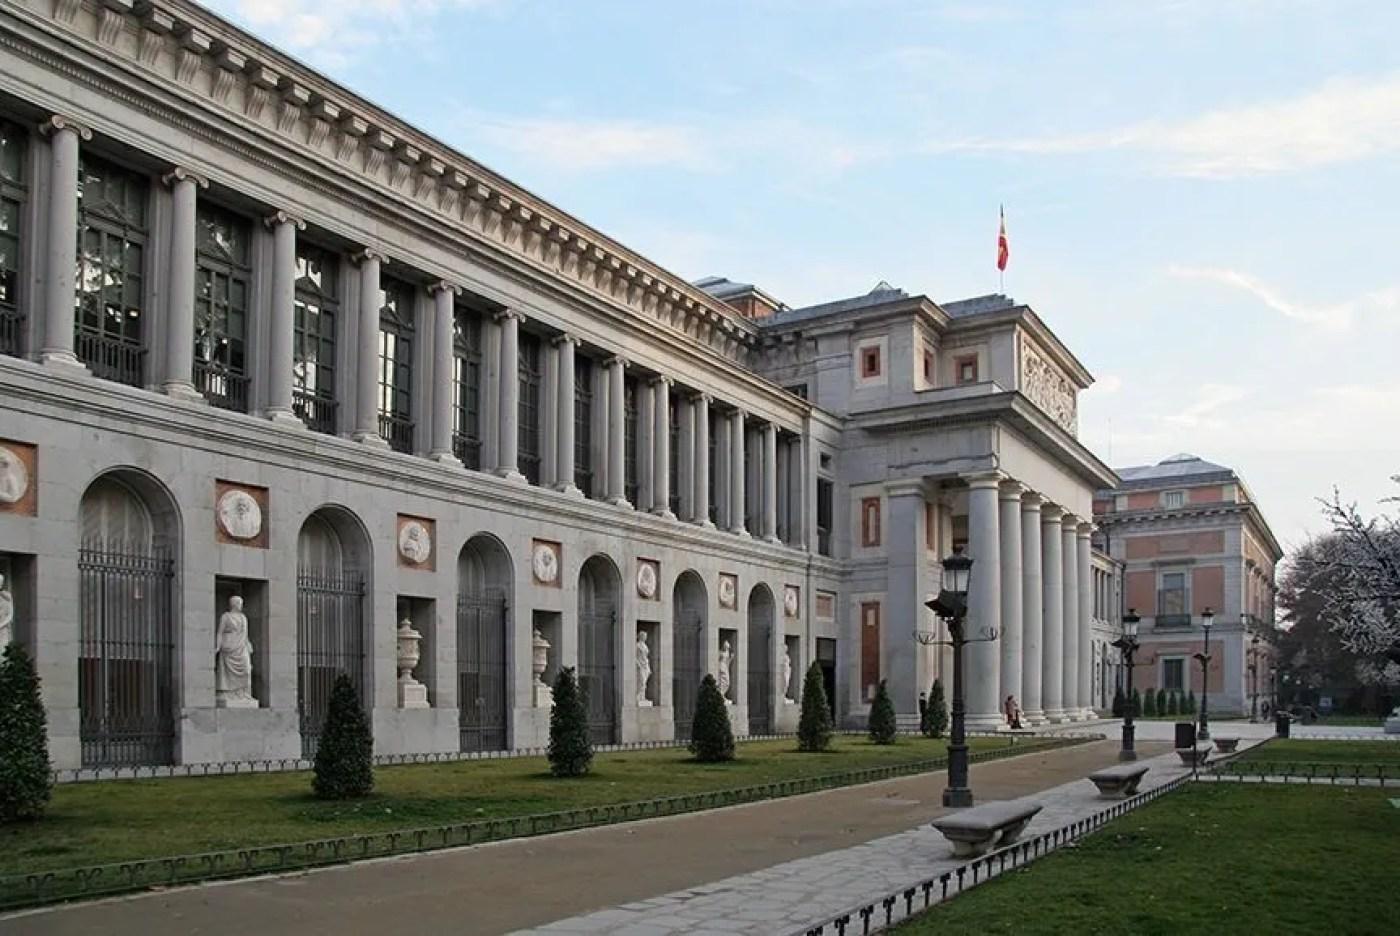 Touring the Prado Museum